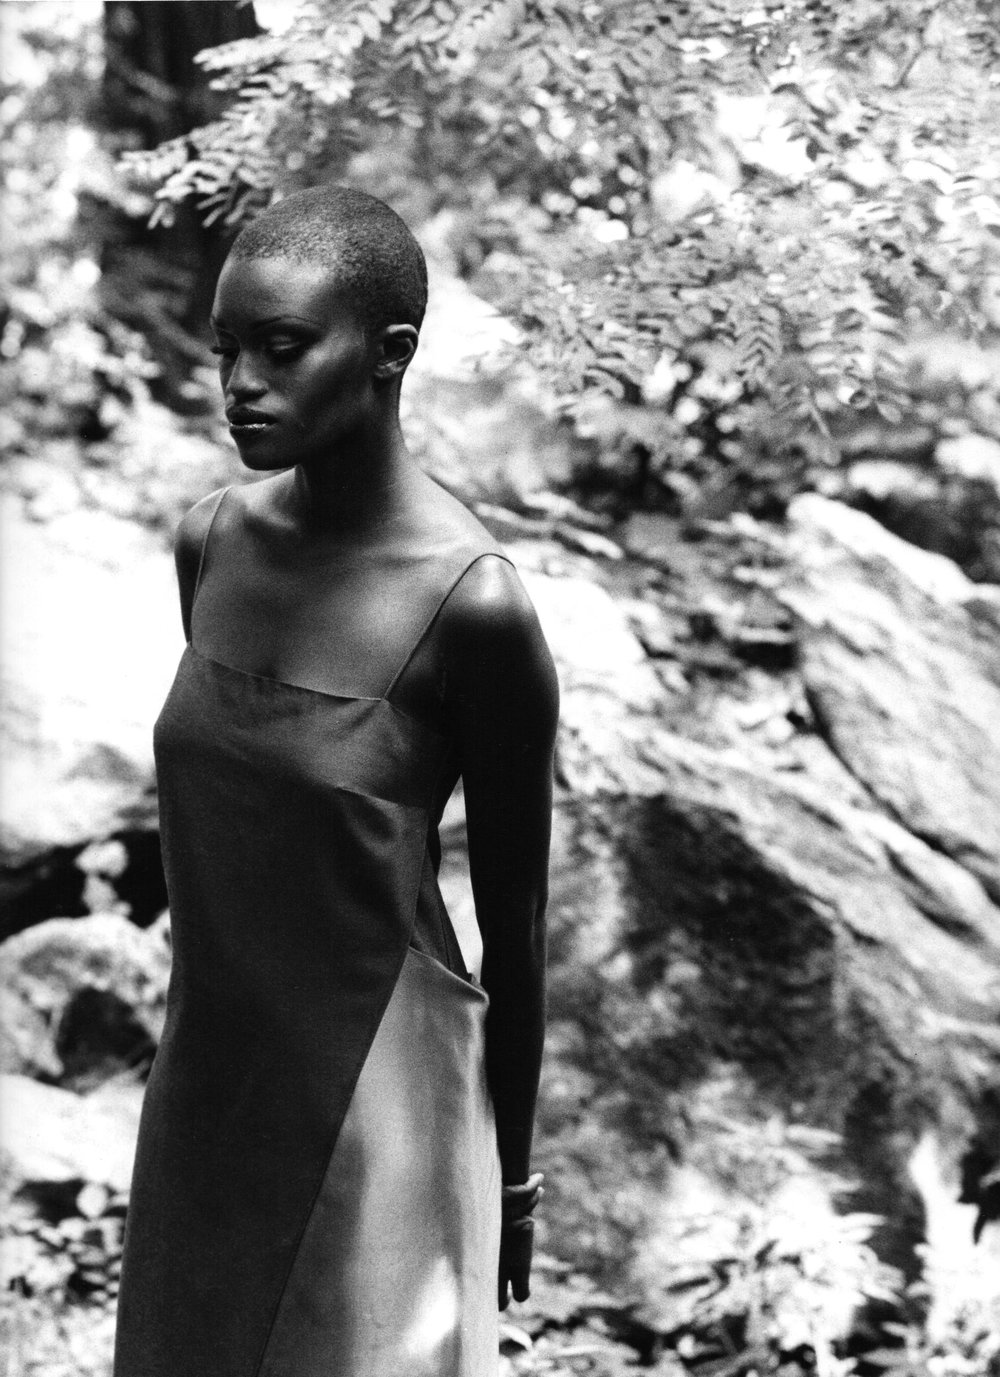 Lois Samuels